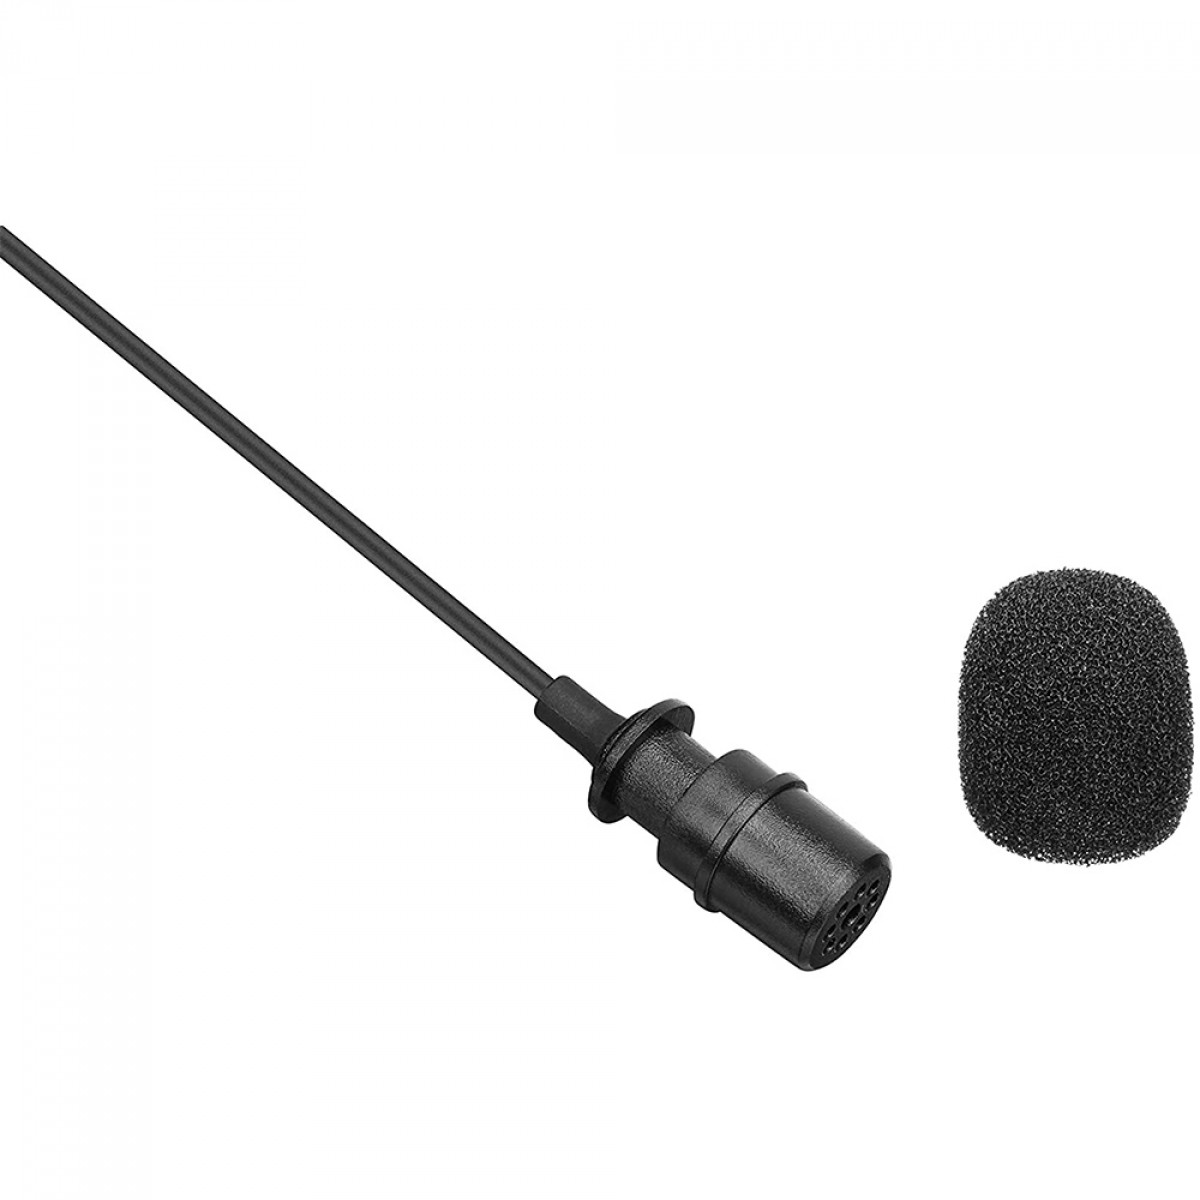 Microfone de Lapela BOYA BY-M1 Pro, Omnidirecional, Com Clip, 3.5mm, Black